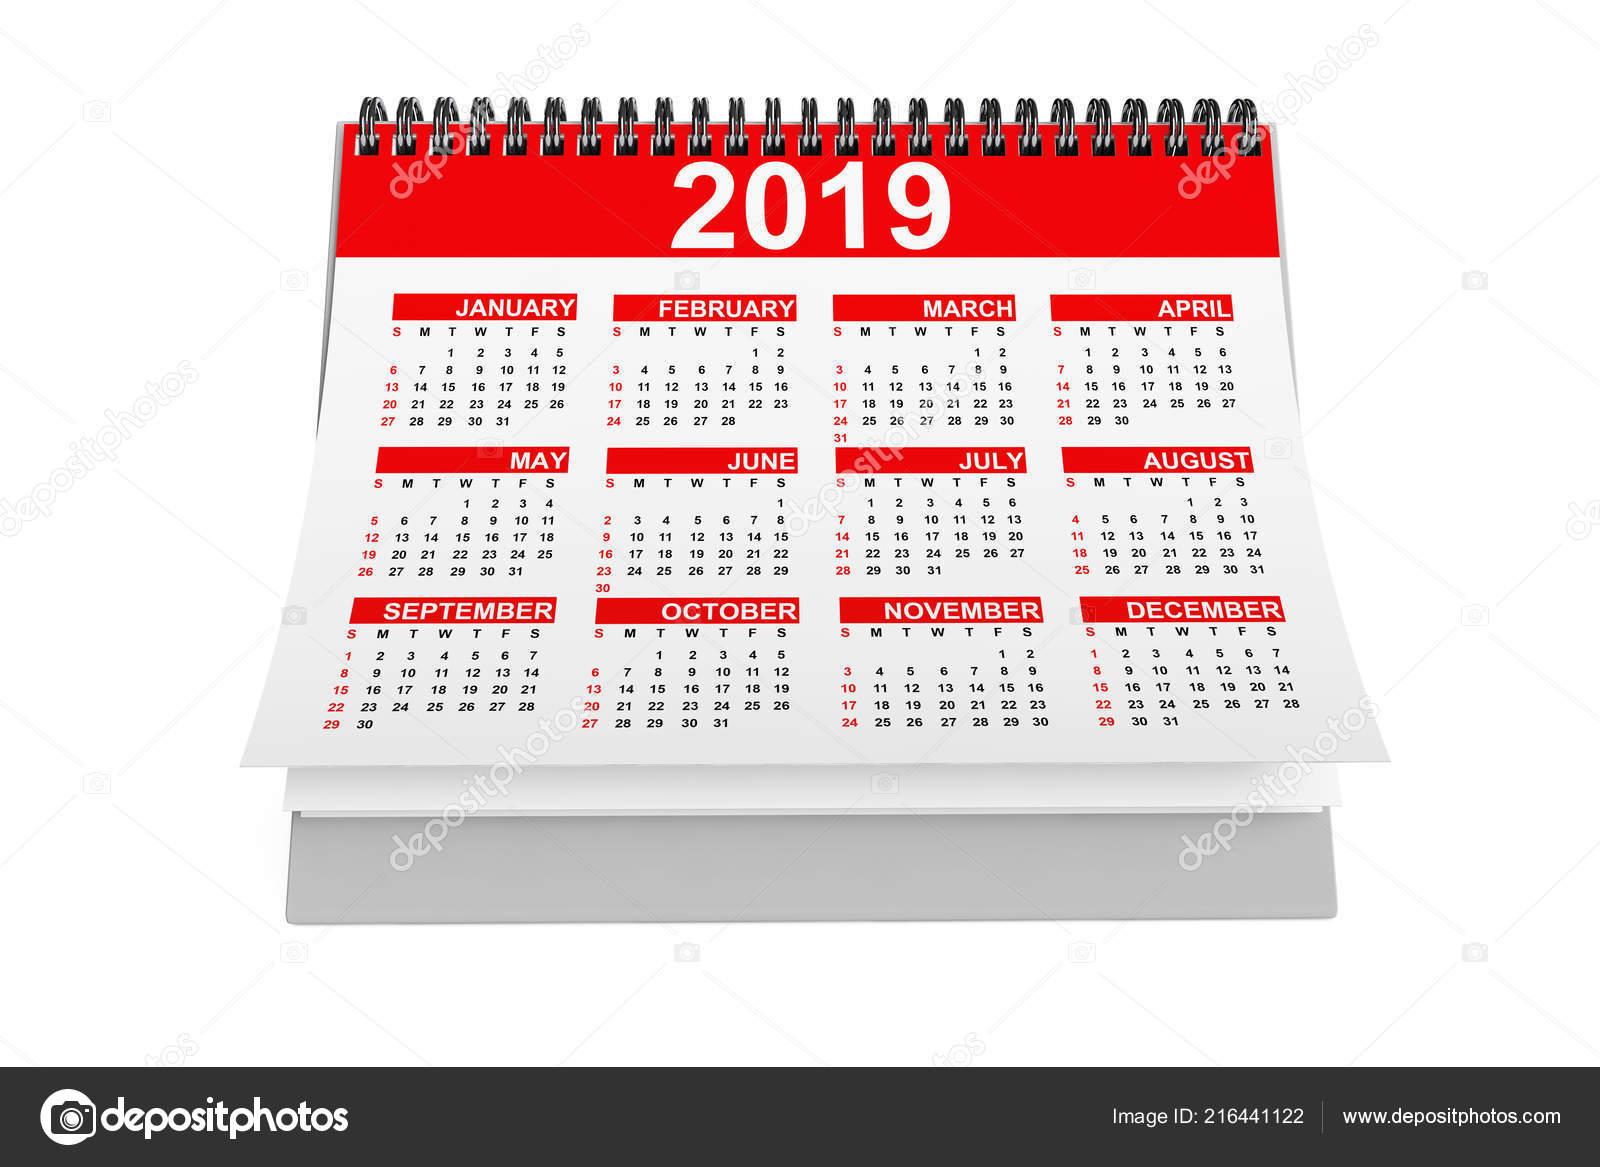 2019 Anno Desktop Calendar Sfondo Bianco Rendering Foto Stock